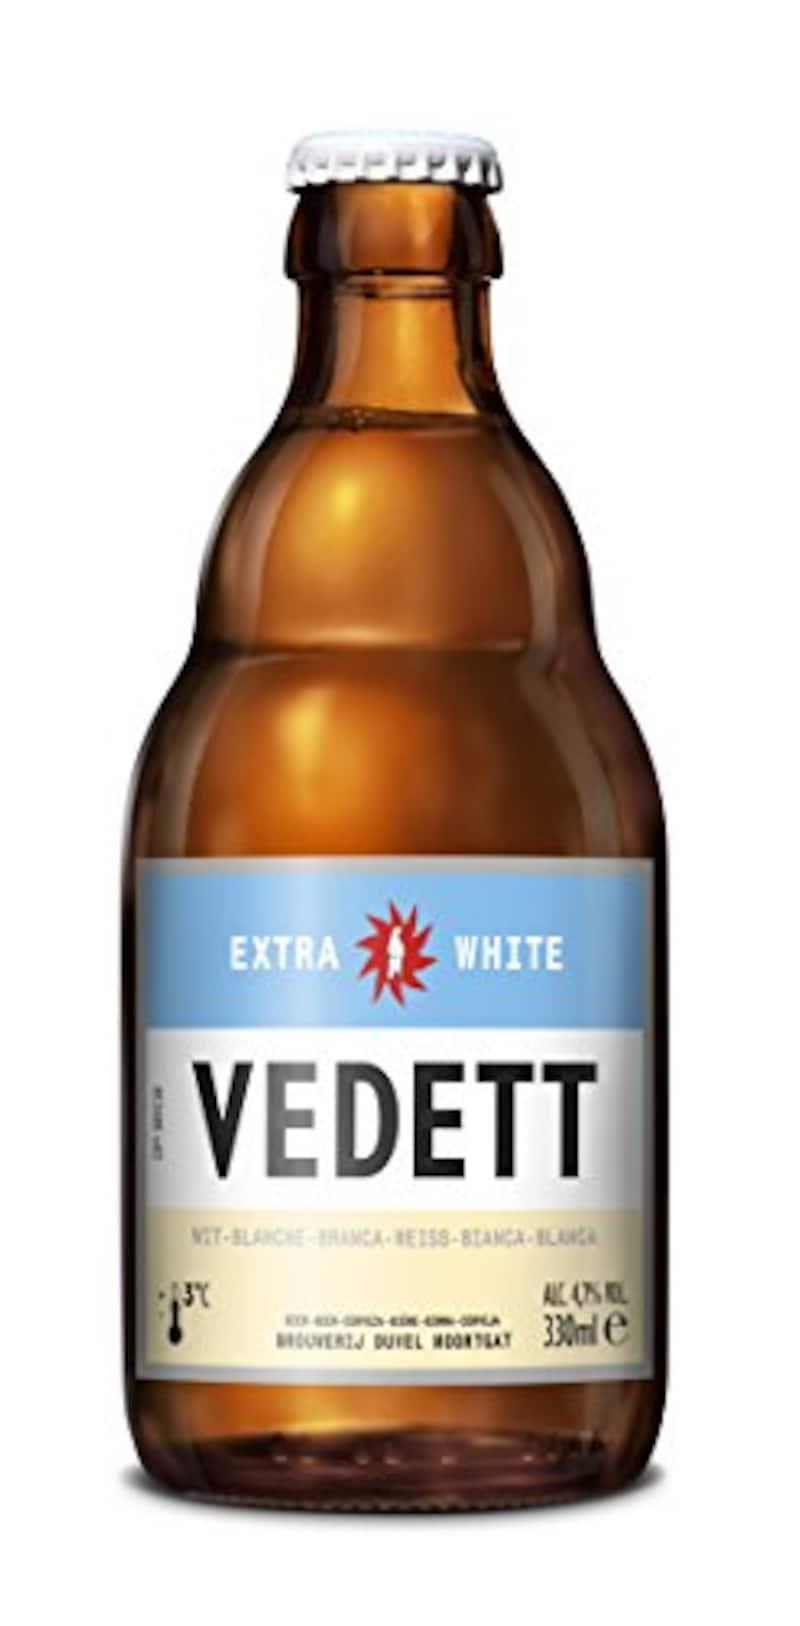 VEDETT EXTRA WHITE,ヴェデット エクストラ・ホワイト 330ml瓶